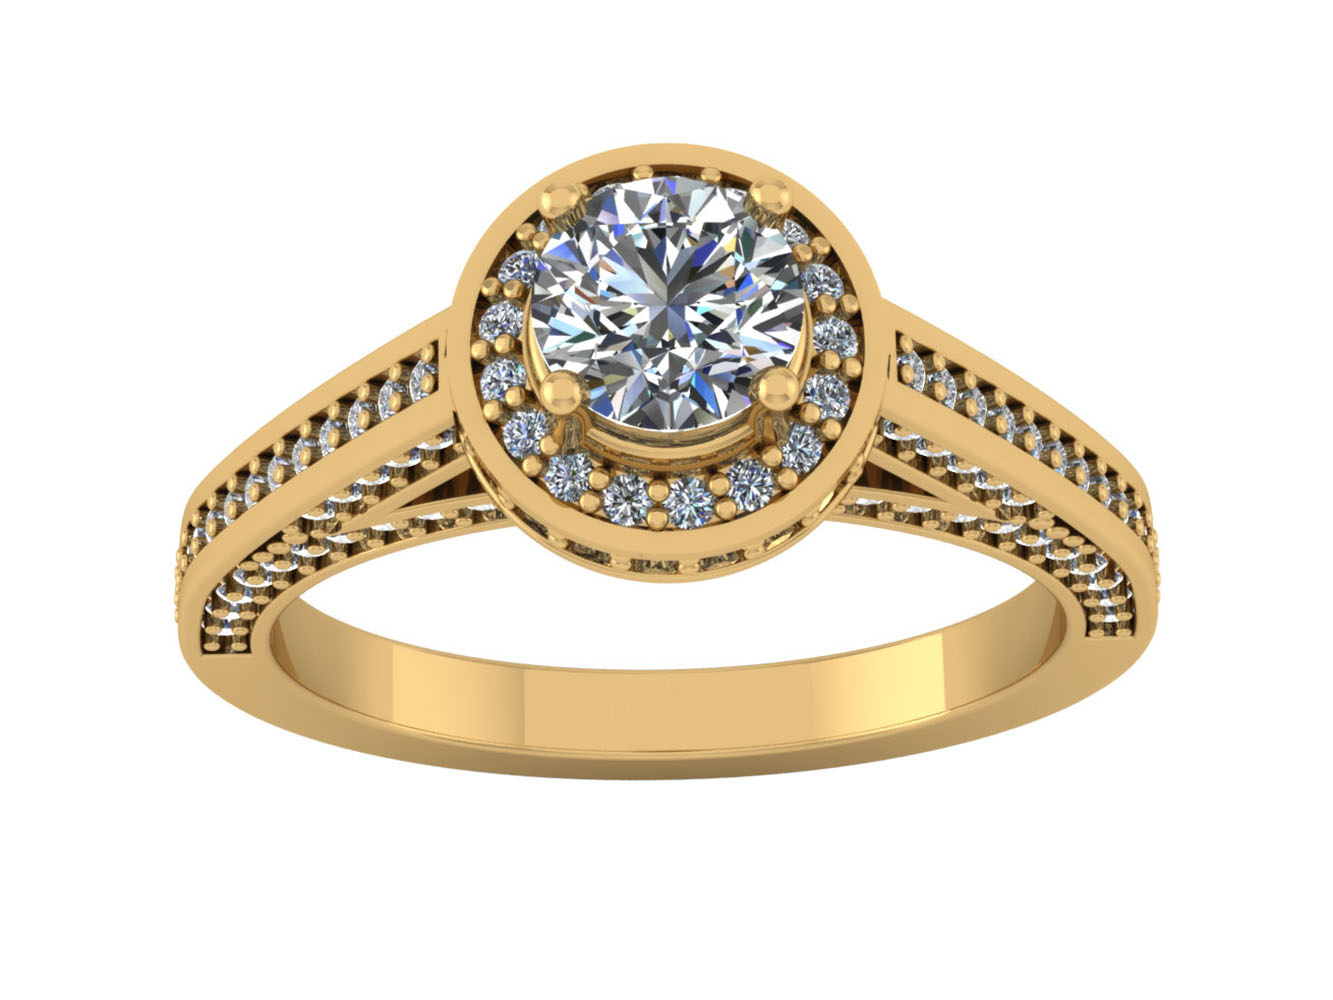 2CARAT Round Brilliant Cut Diamond Women's Halo Engagement ...